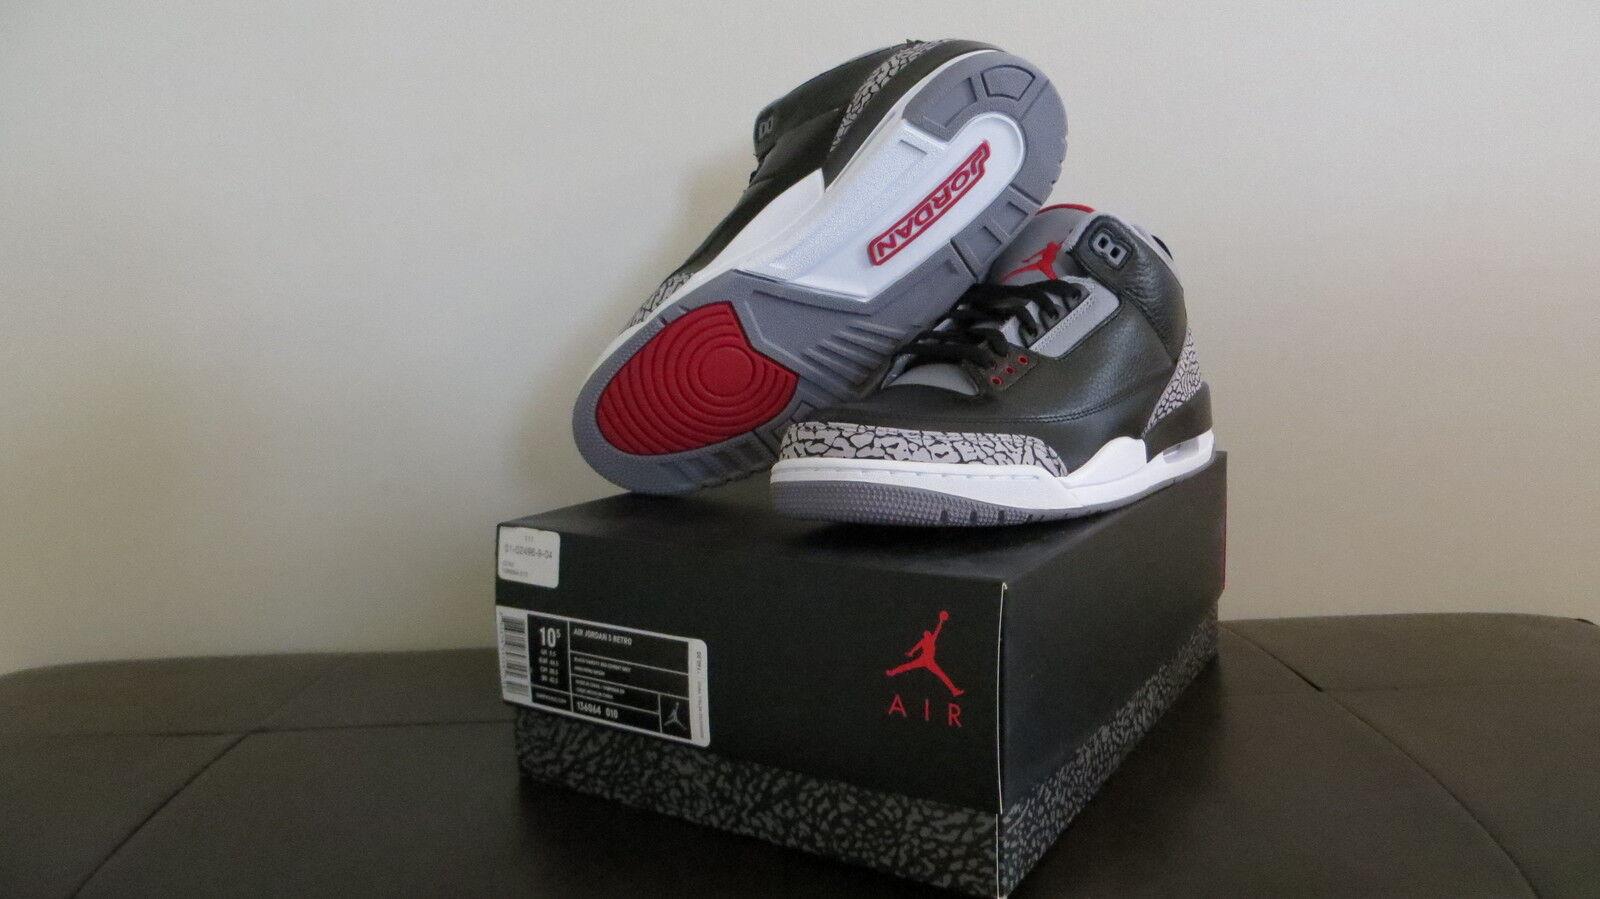 Nike jordan air jordan Nike iii schwarze zement 10,5 7d8f8d